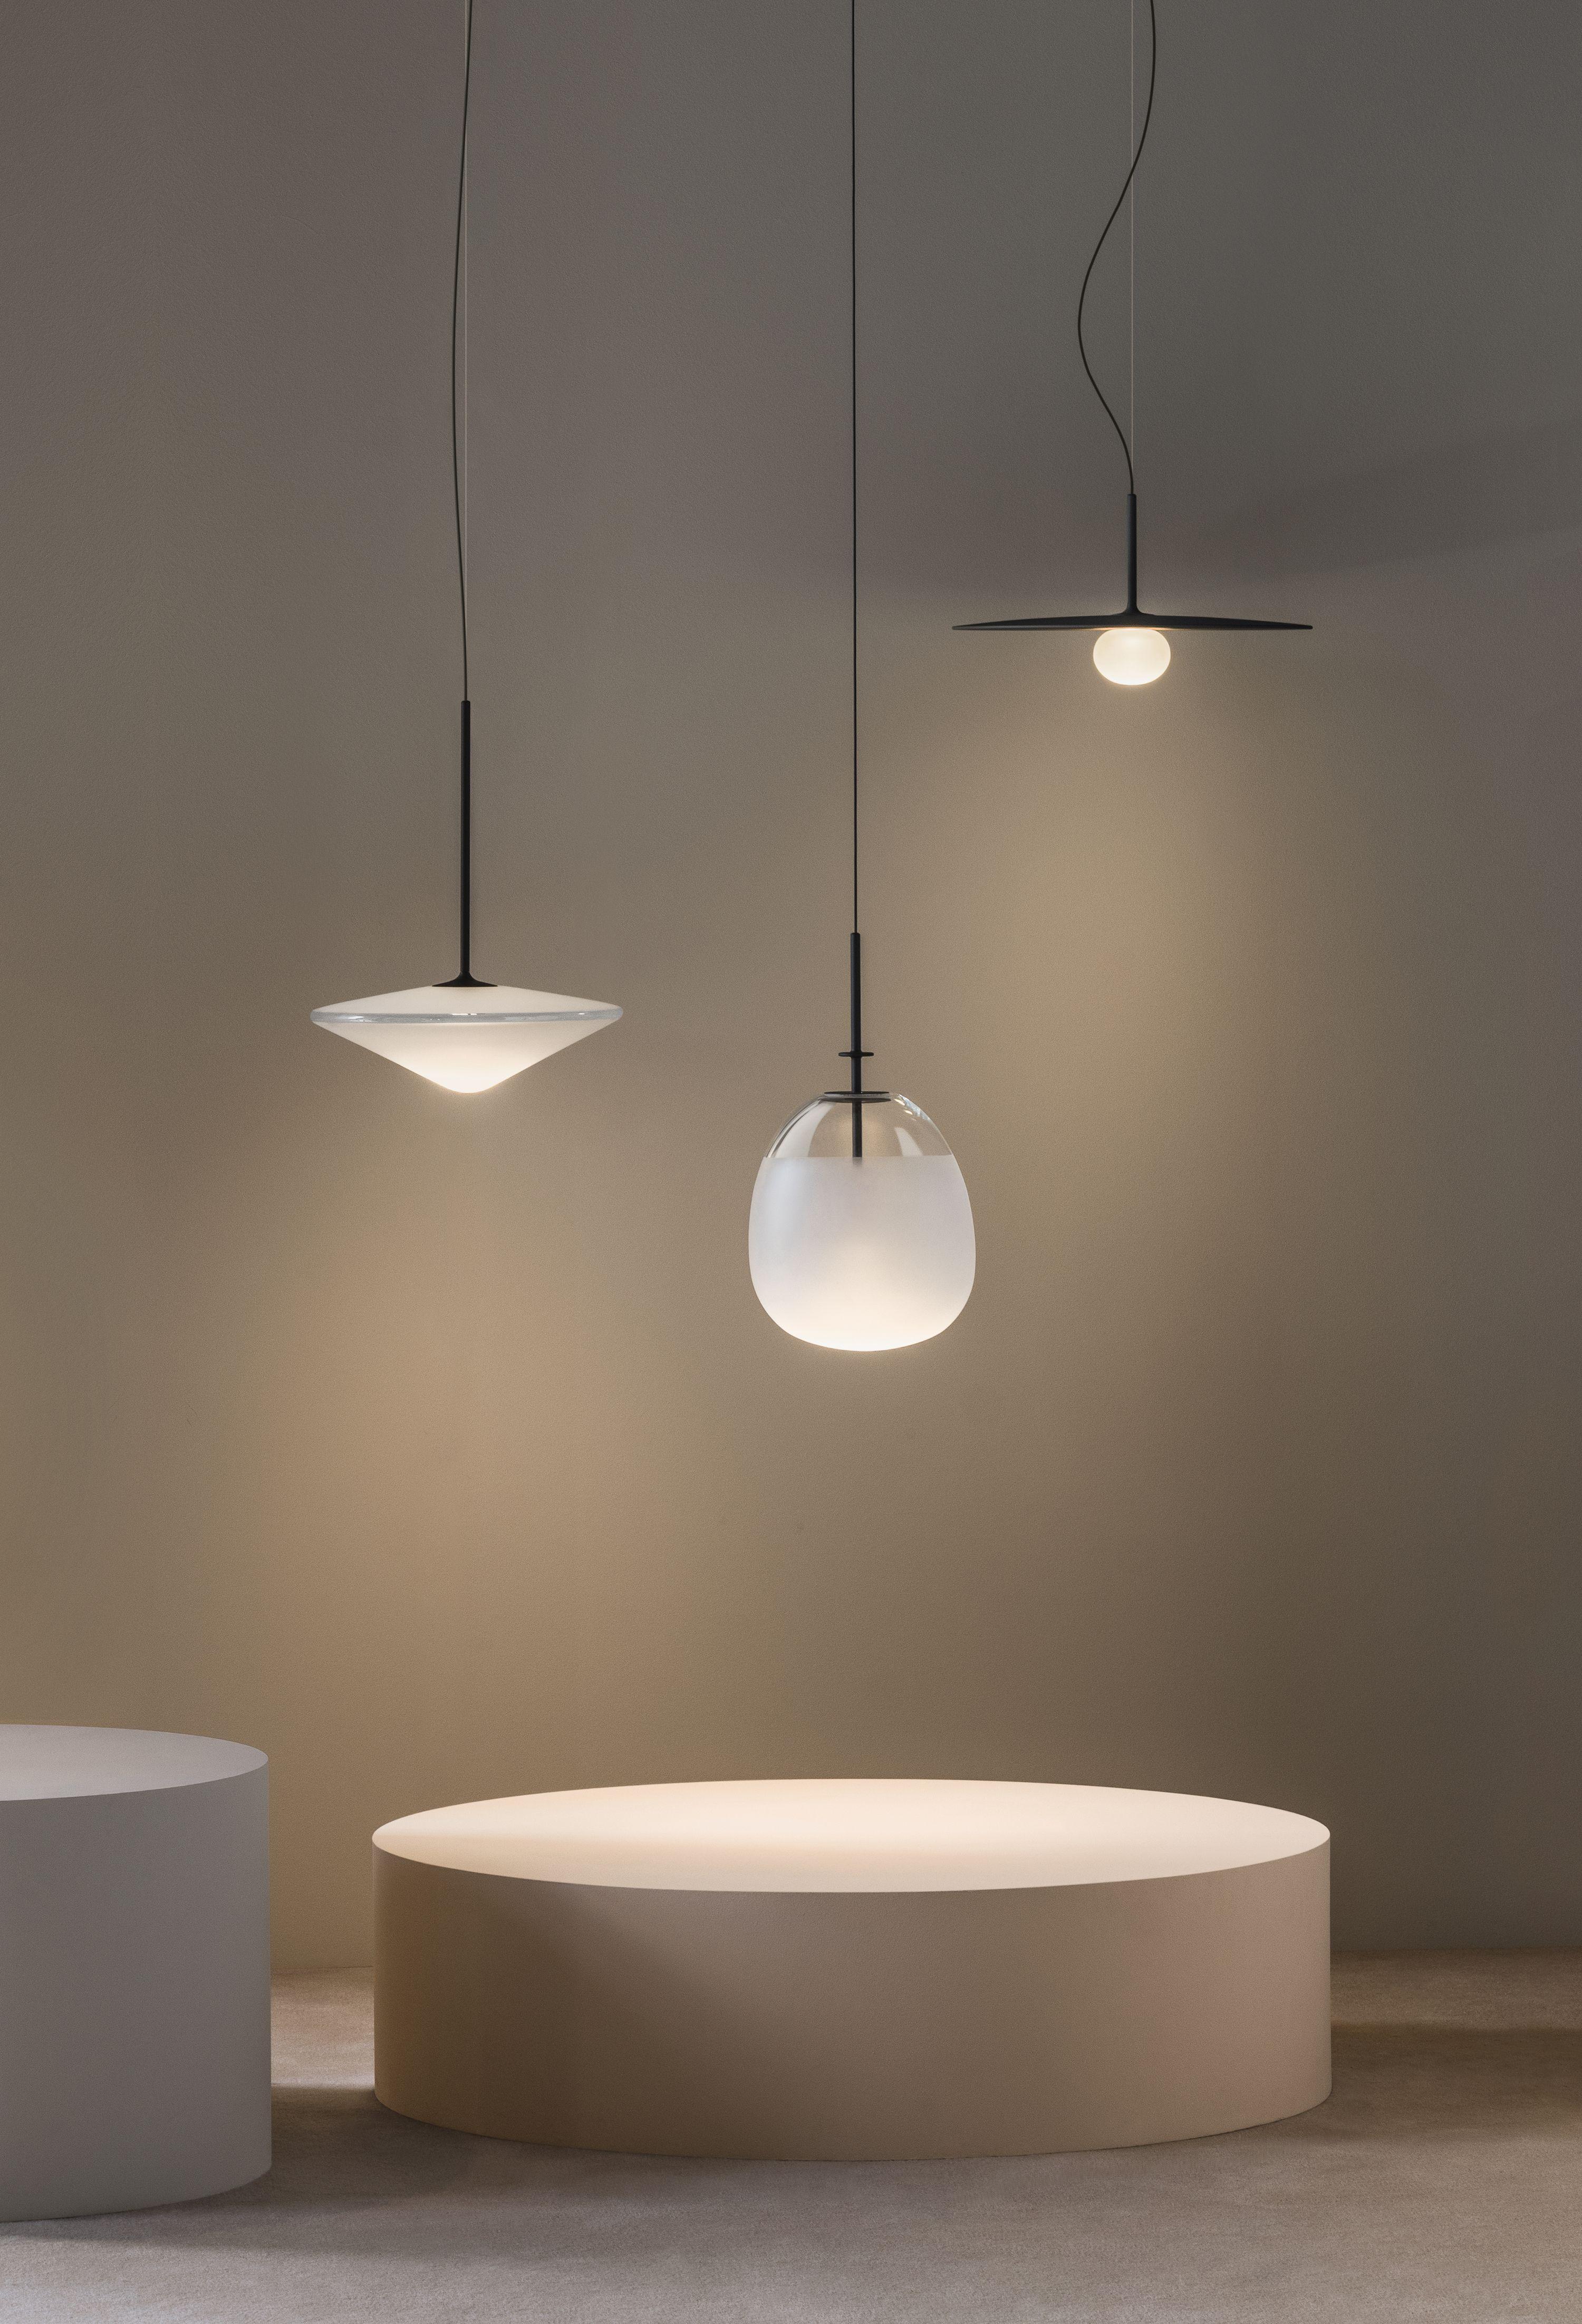 Tempo Vibia Lievore Altherr Geometric Lamp Unique Lamps